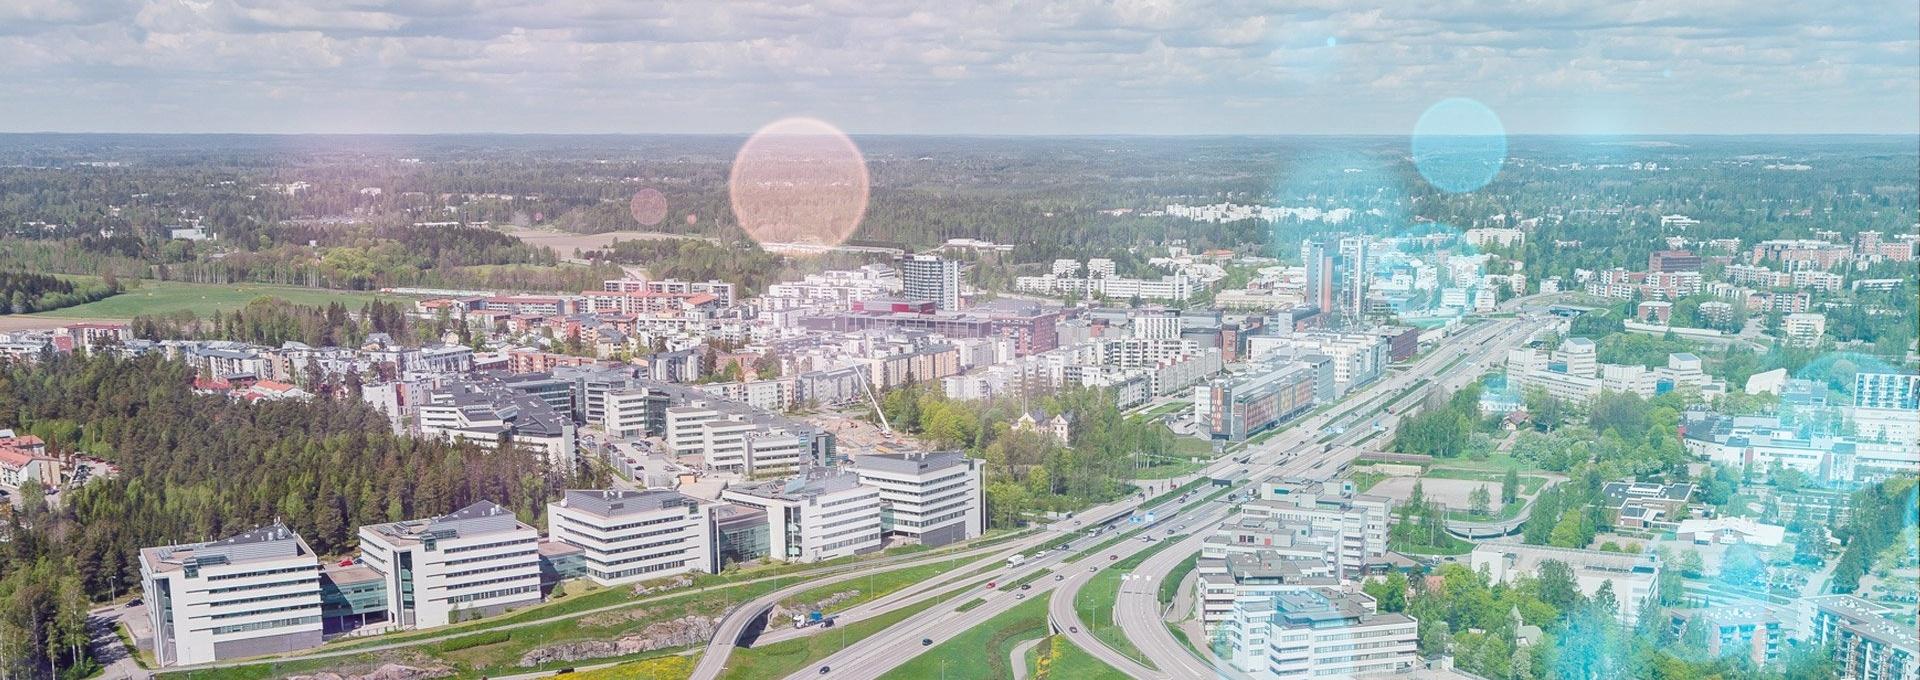 Ecolane_Finland_main-492454-edited.jpg